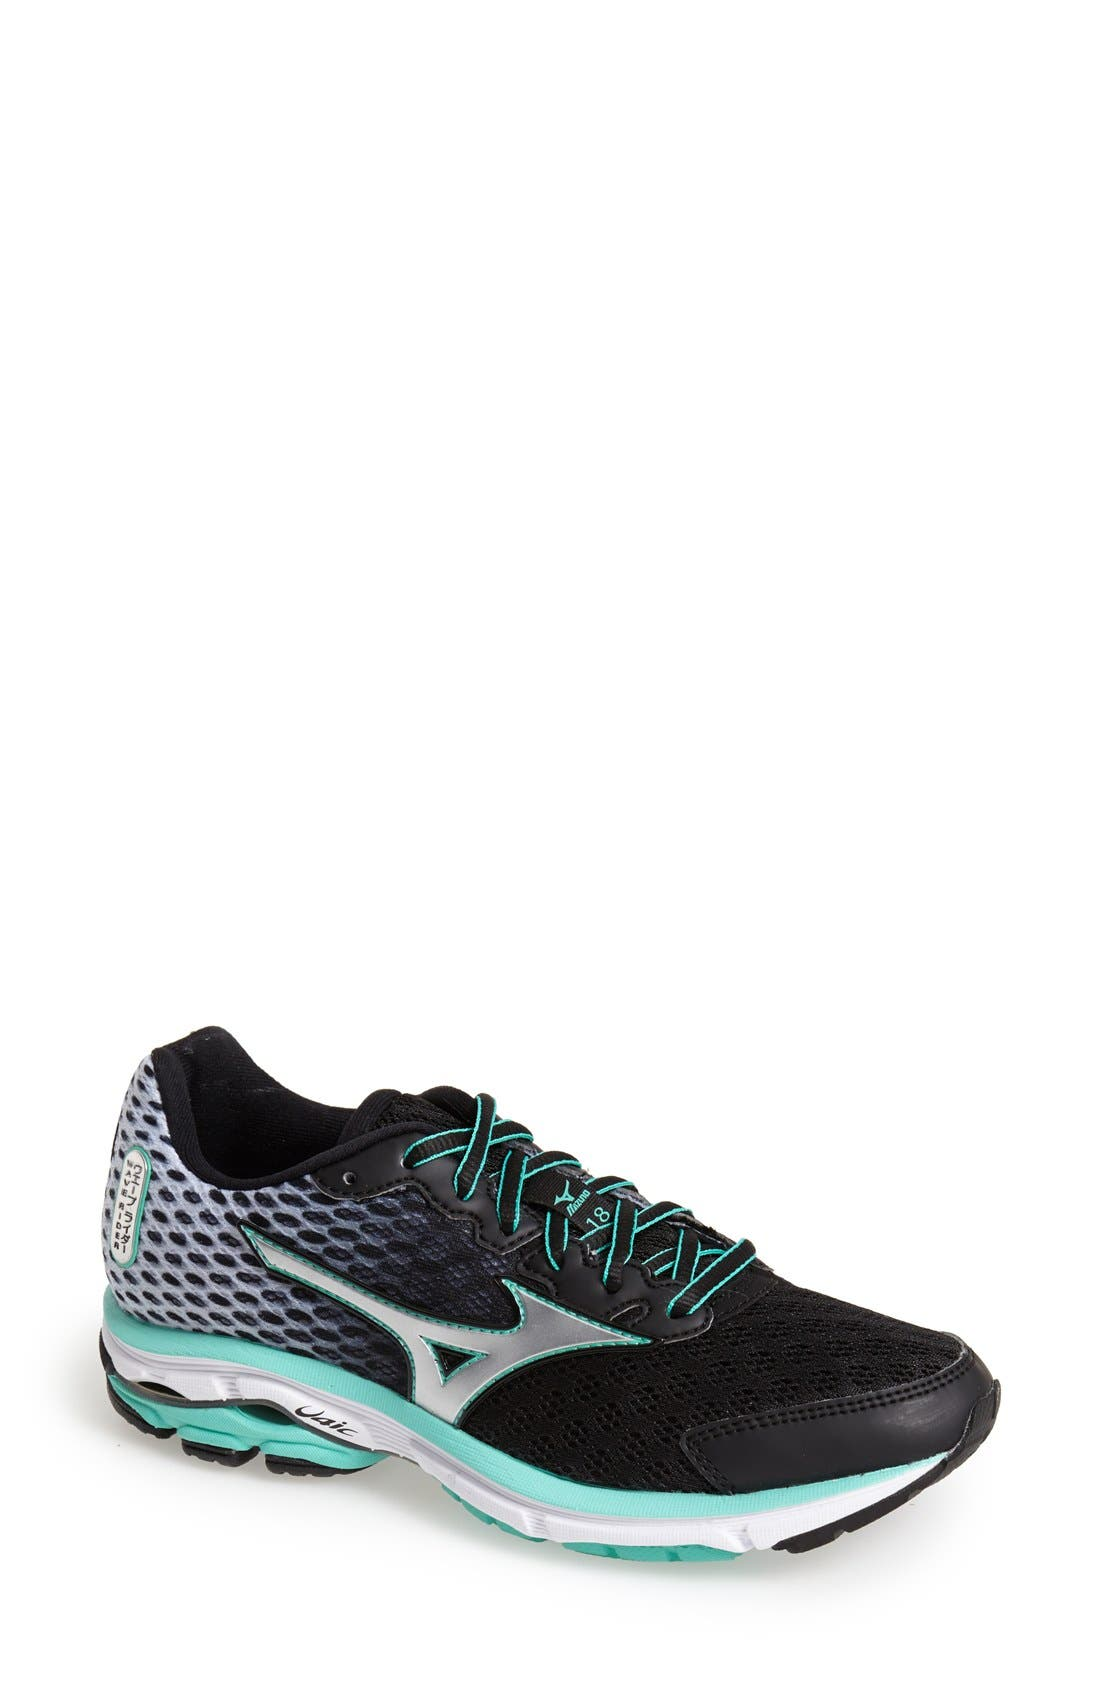 mizuno wave rider 18 running shoes